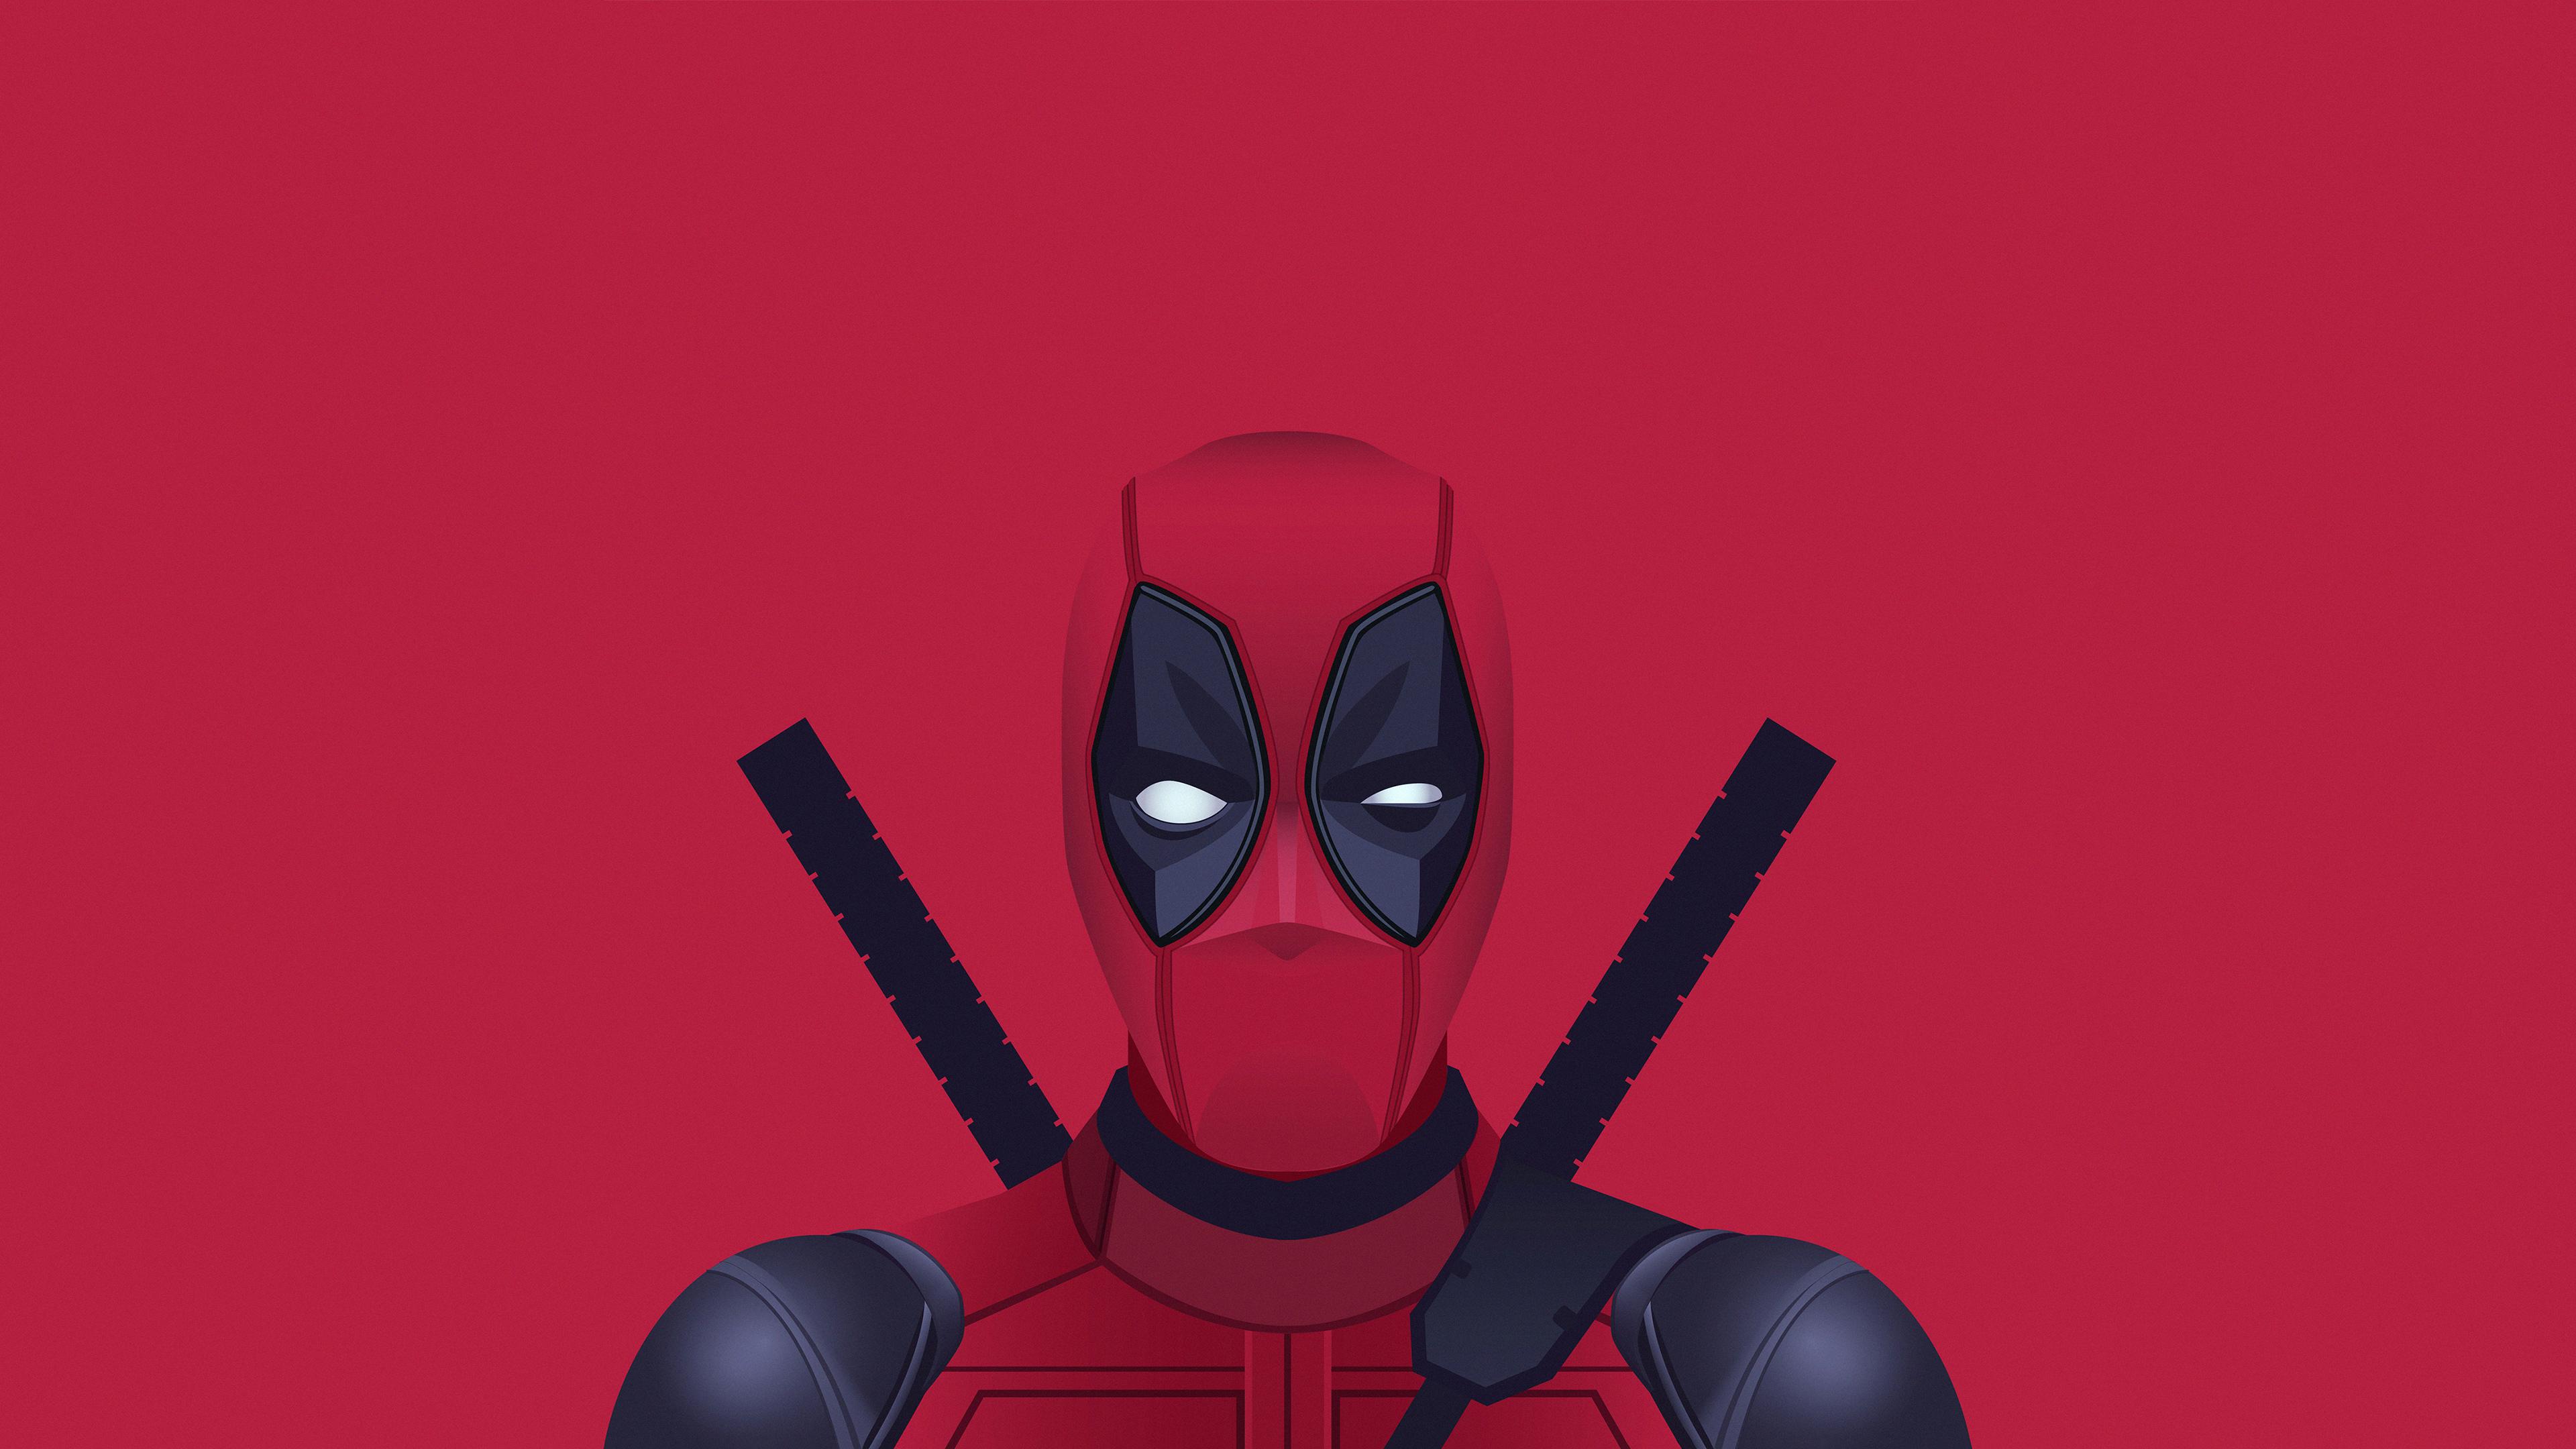 deadpool arts 4k 1553071103 - Deadpool Arts 4k - superheroes wallpapers, hd-wallpapers, digital art wallpapers, deadpool wallpapers, behance wallpapers, artwork wallpapers, artist wallpapers, 4k-wallpapers